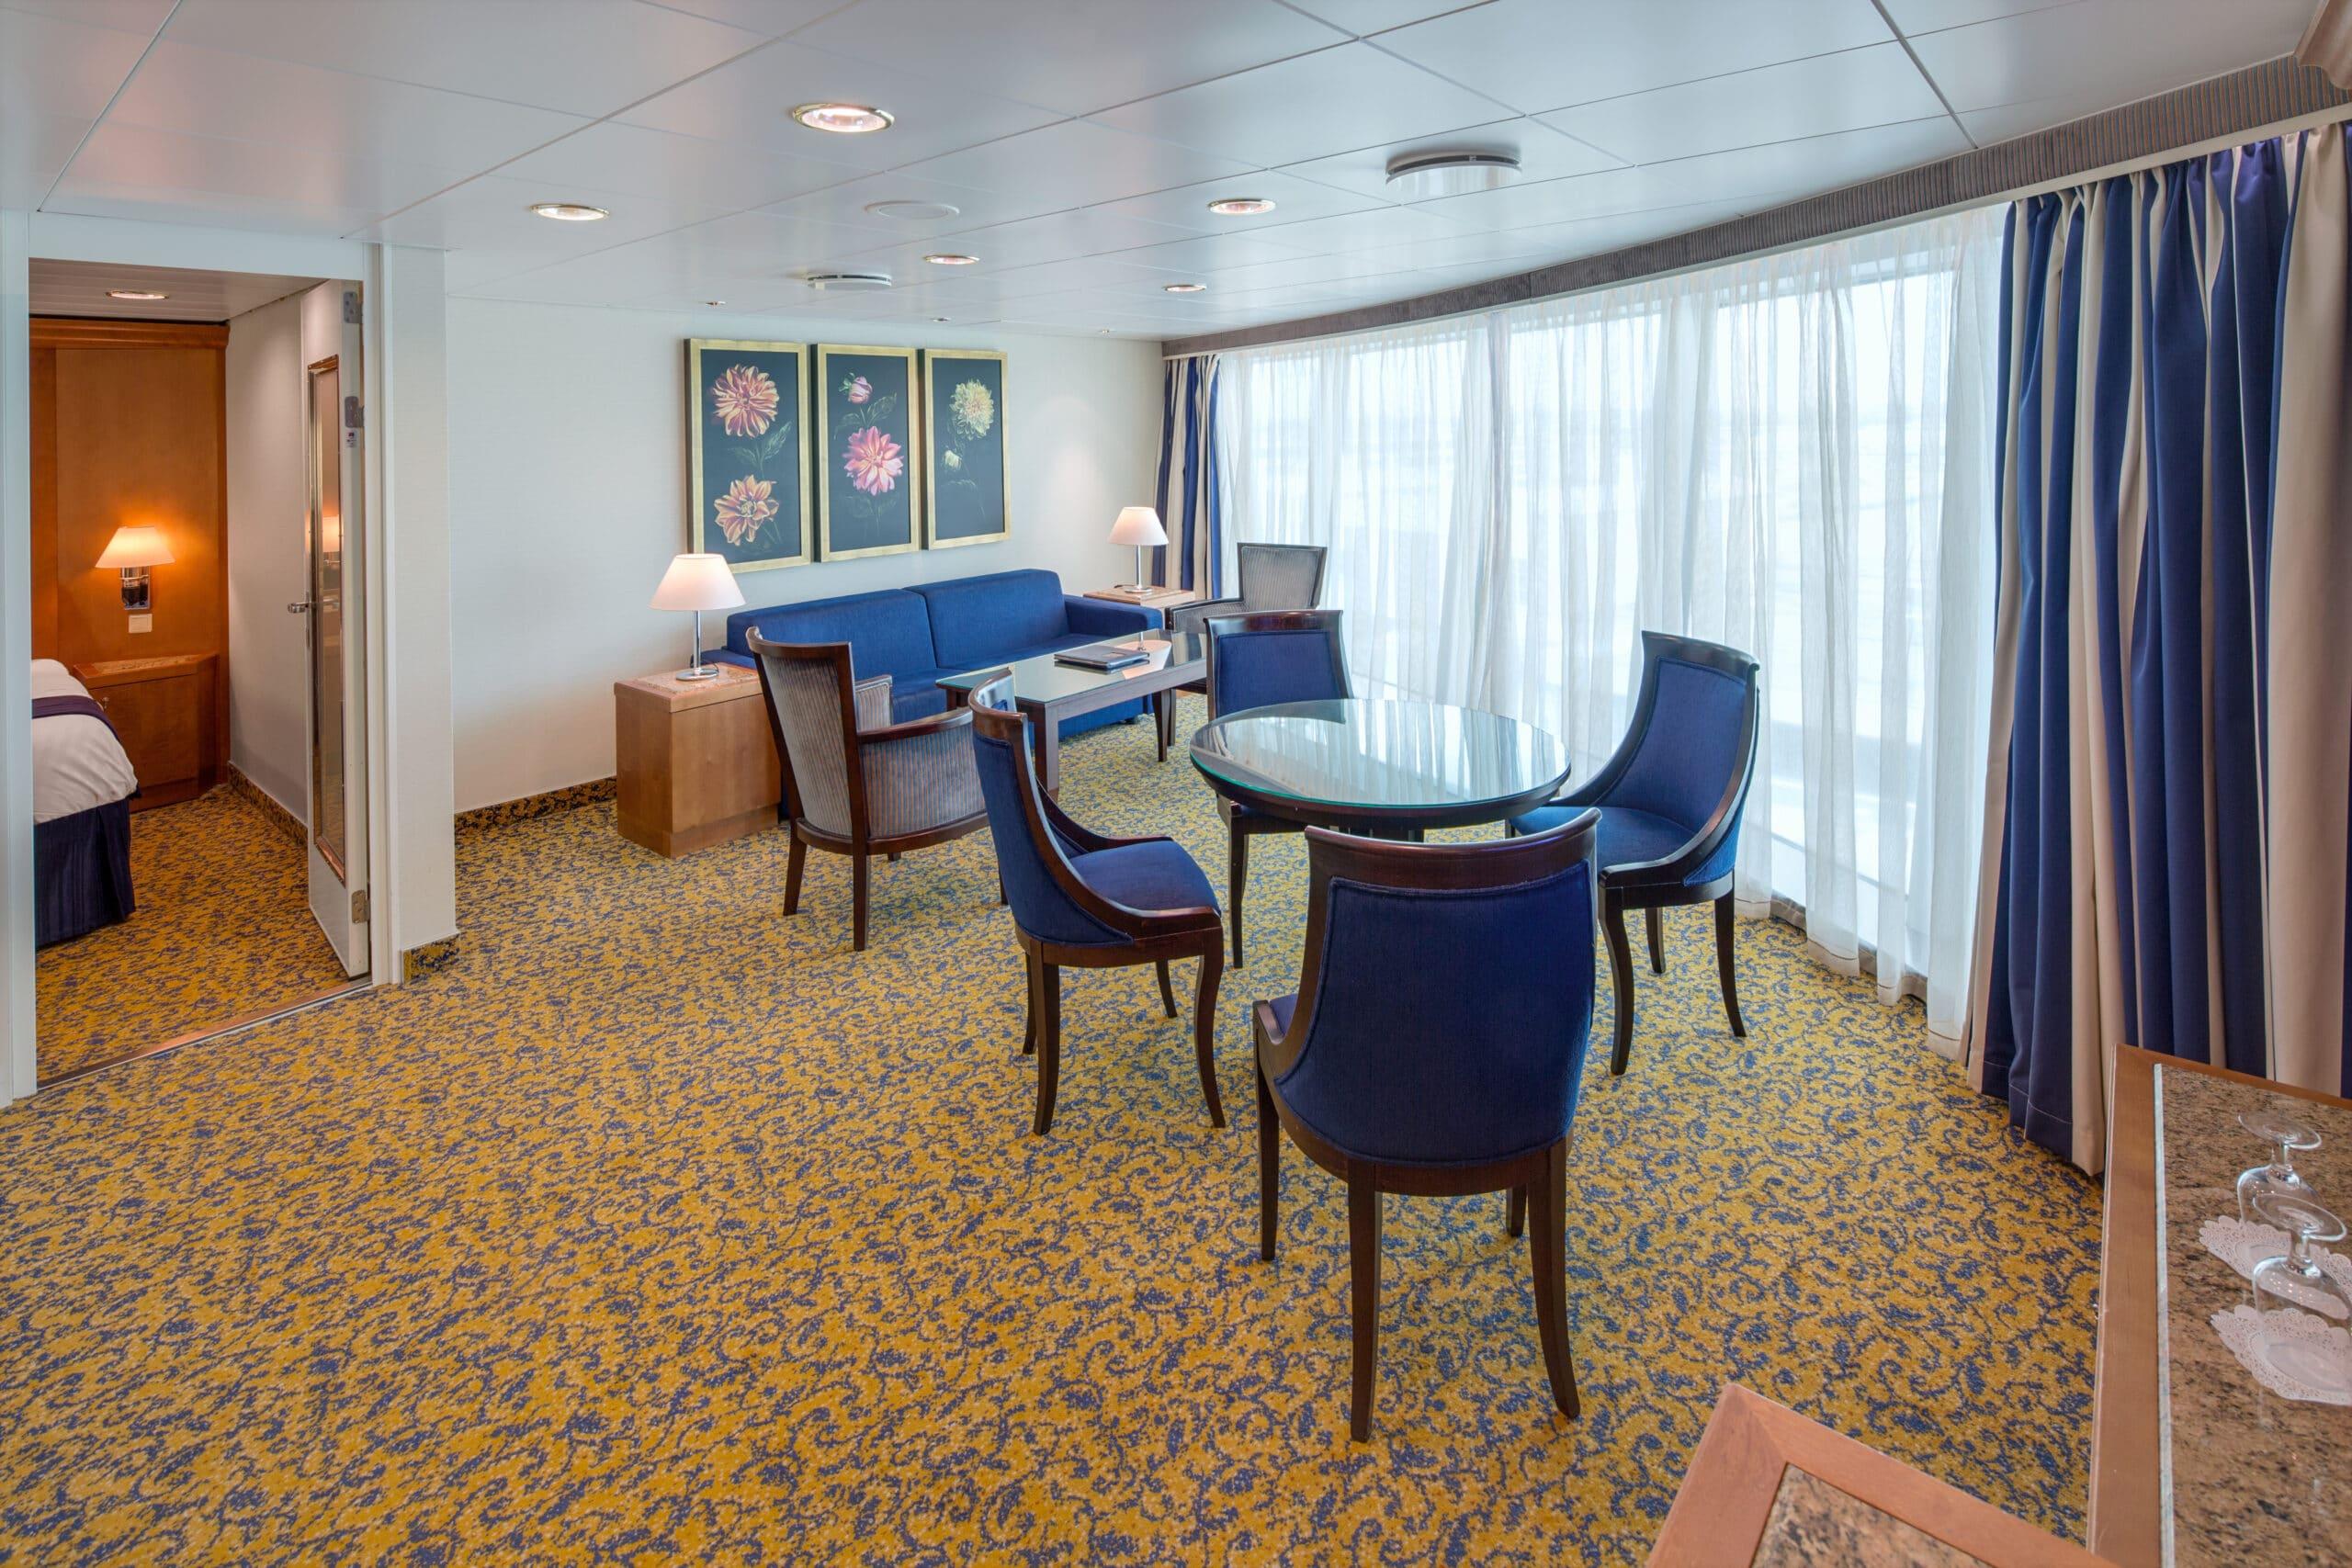 Royal-Caribbean-International-Serenade-of-the-Seas-schip-cruiseschip-categorie-VT-Ocean-Suite-2-bedroom